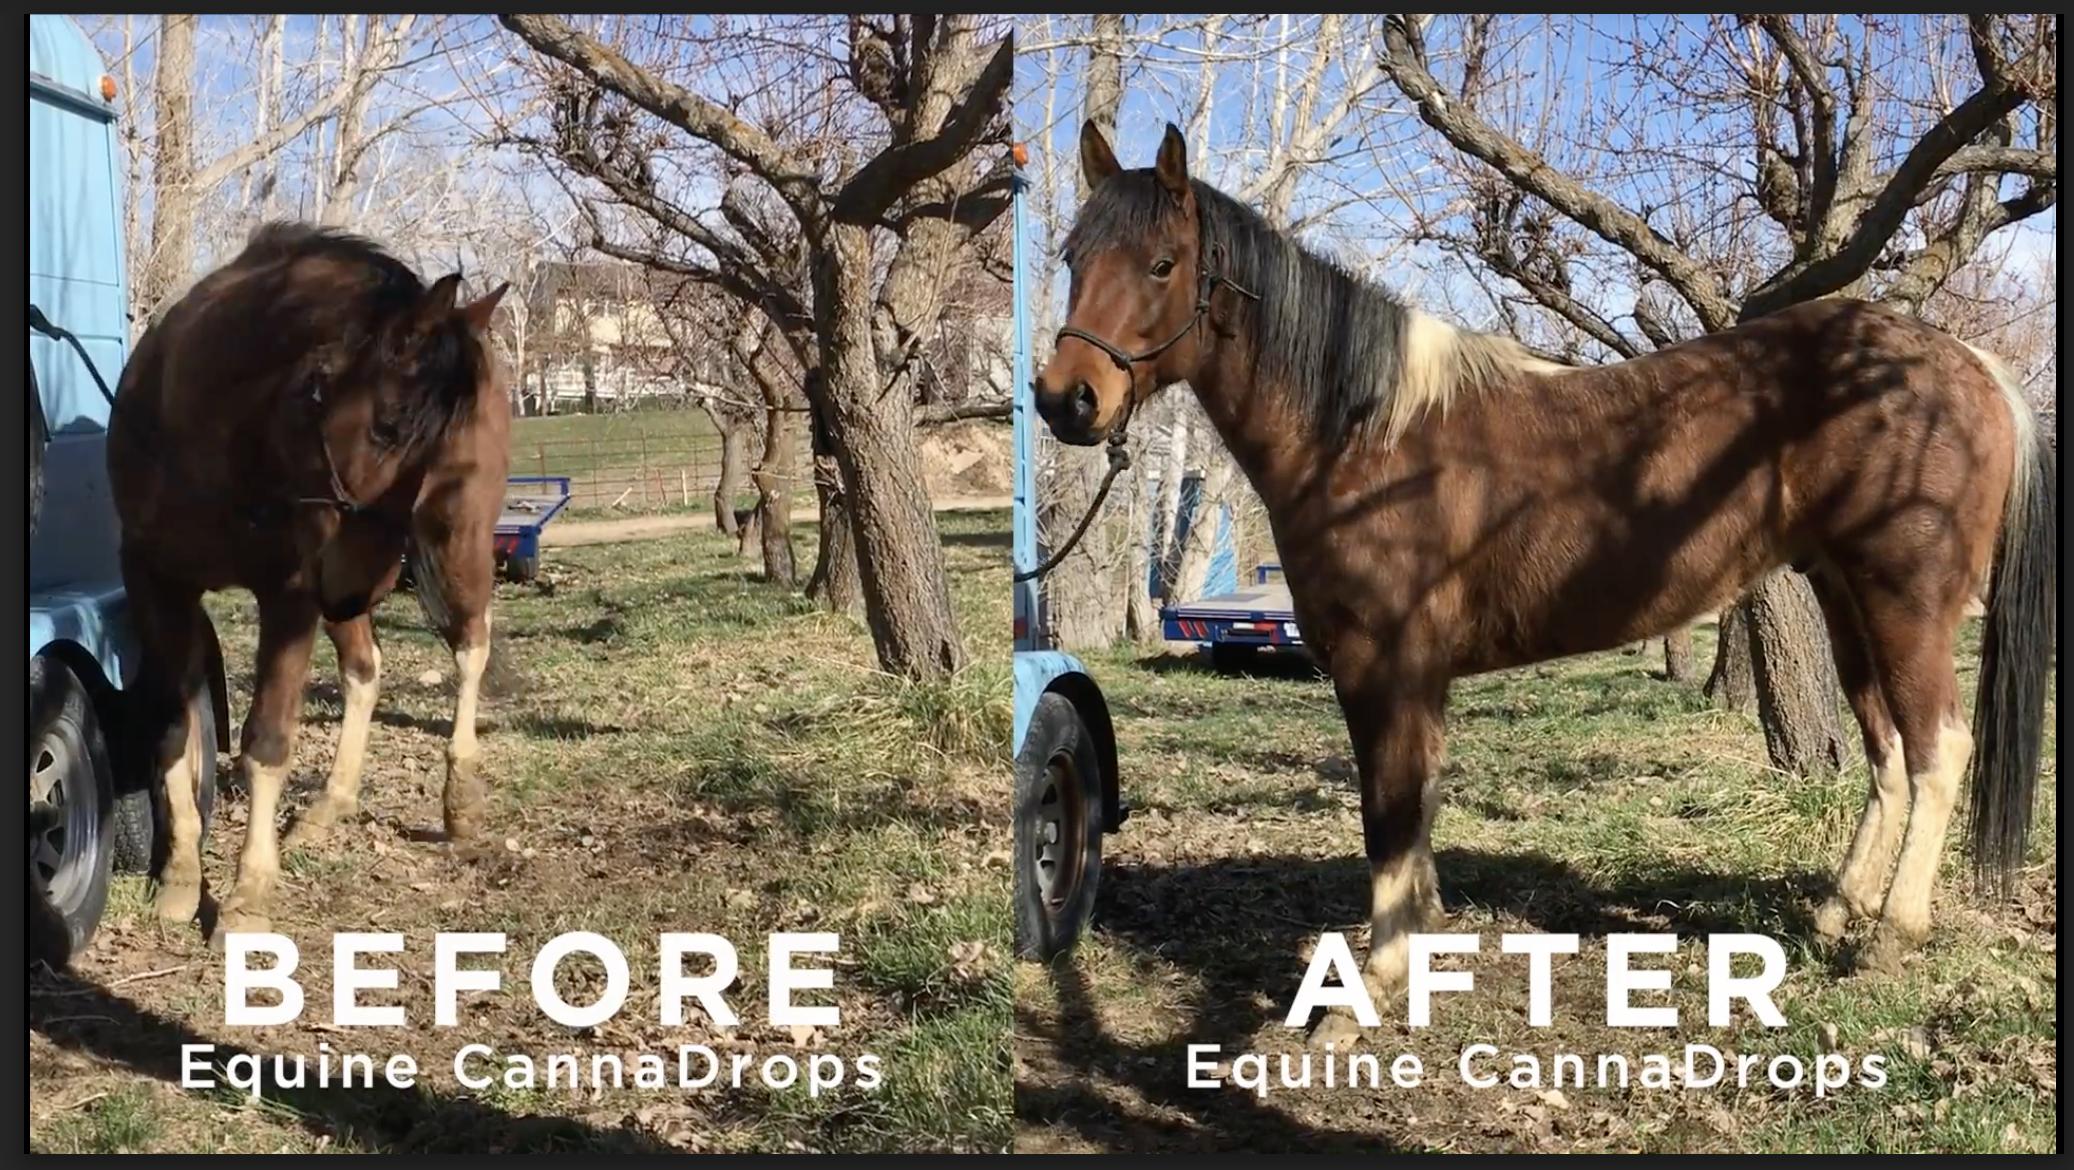 Equine CannaDrops horse hemp